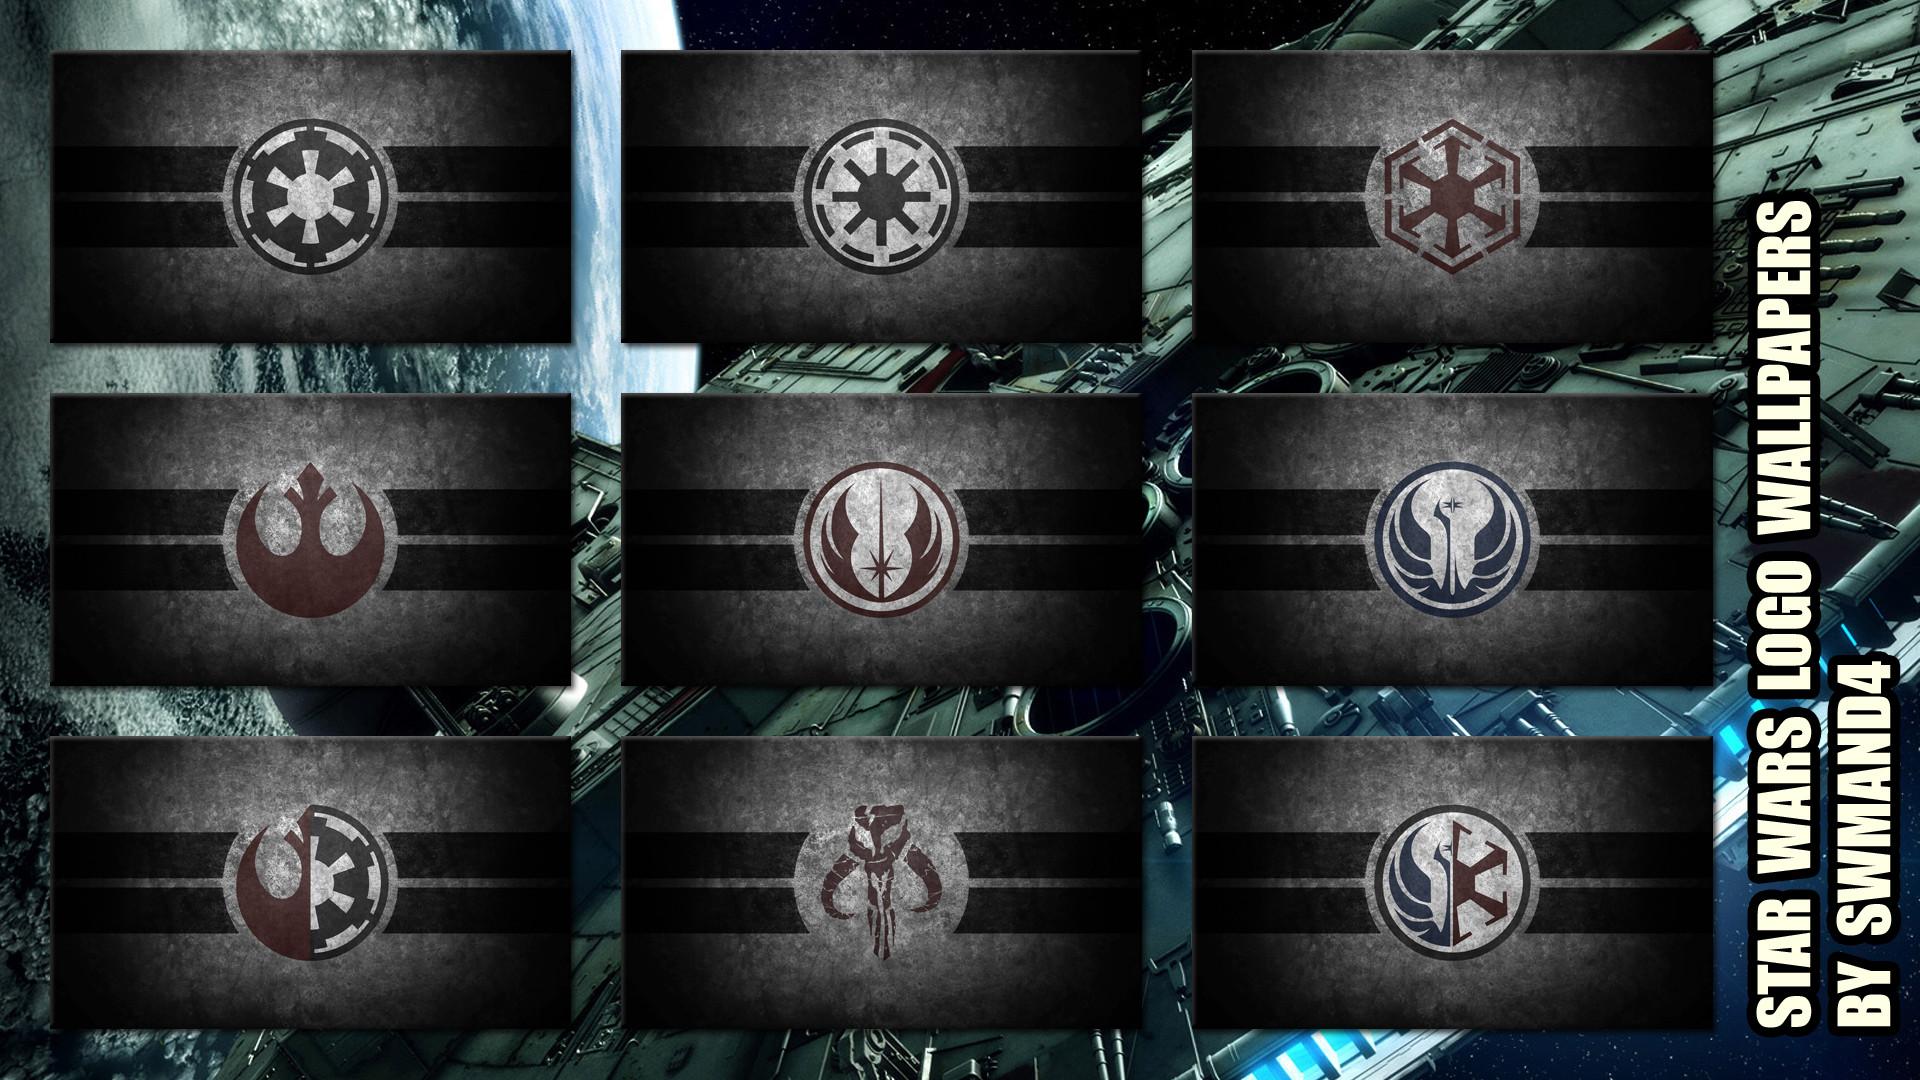 Star Wars Jedi Symbol Wallpaper 74 Pictures